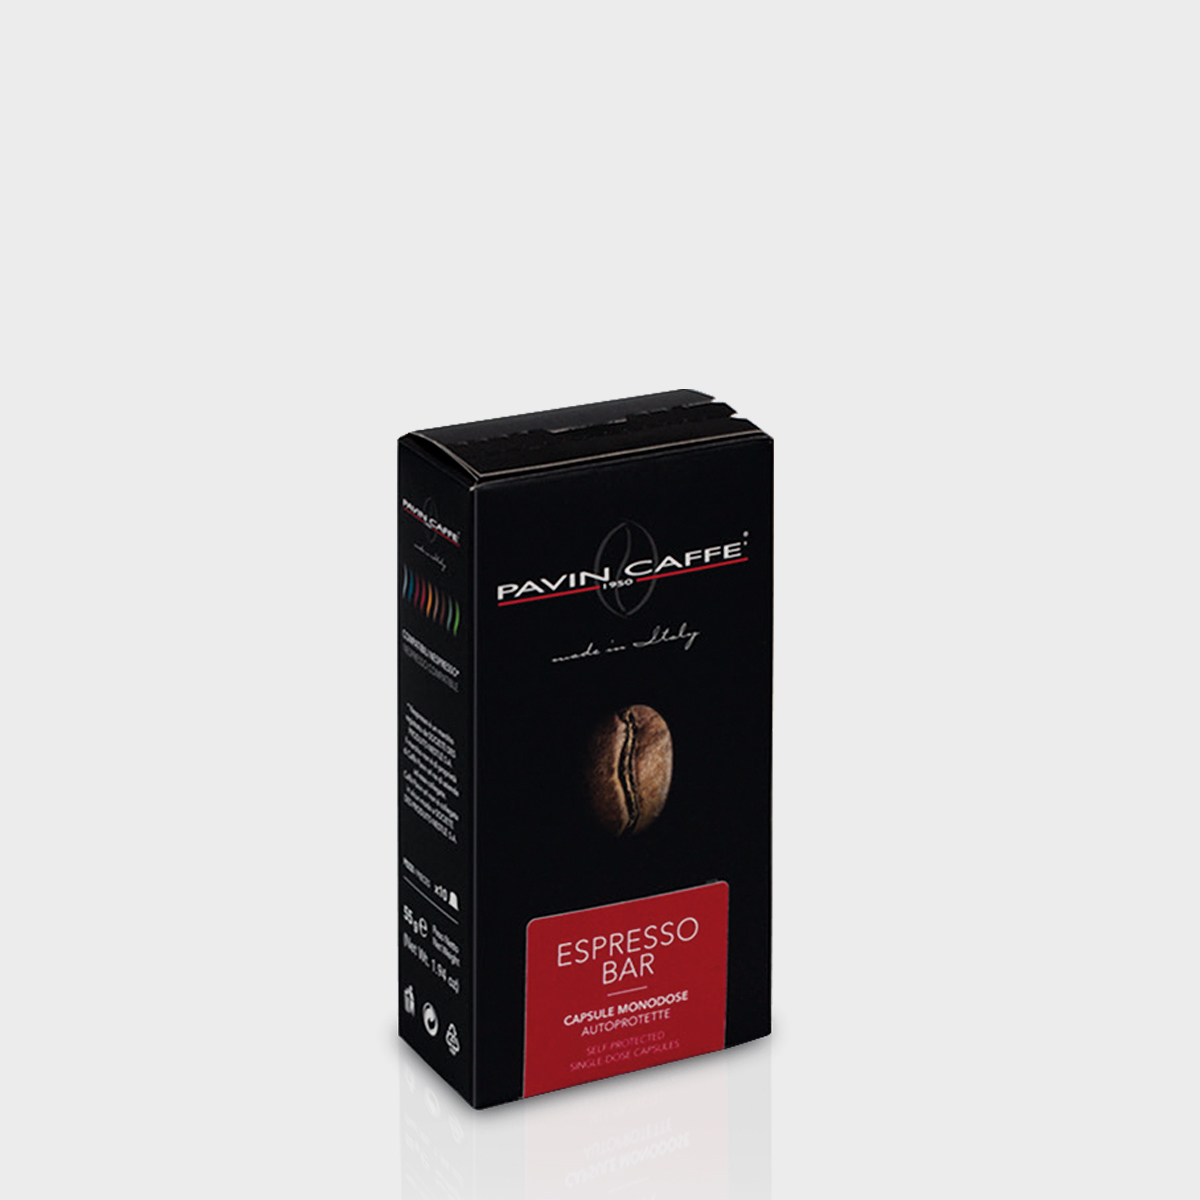 pavin-caffe-capsule-monodose-compatibili-nespresso-espresso-bar